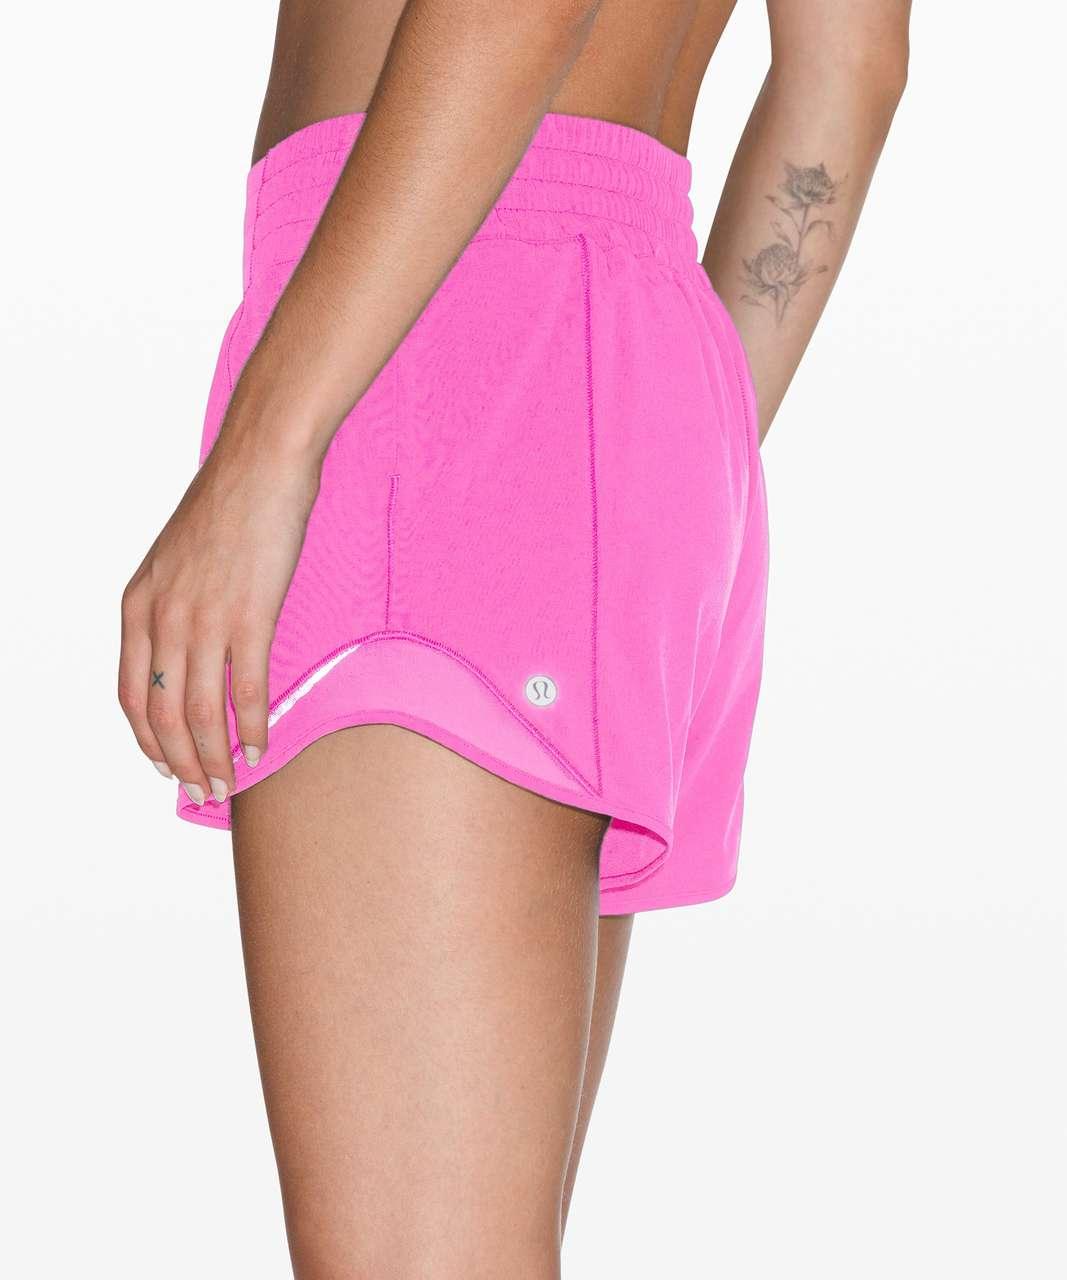 "Lululemon Hotty Hot Short *High-Rise Long 4"" - Dark Prism Pink"